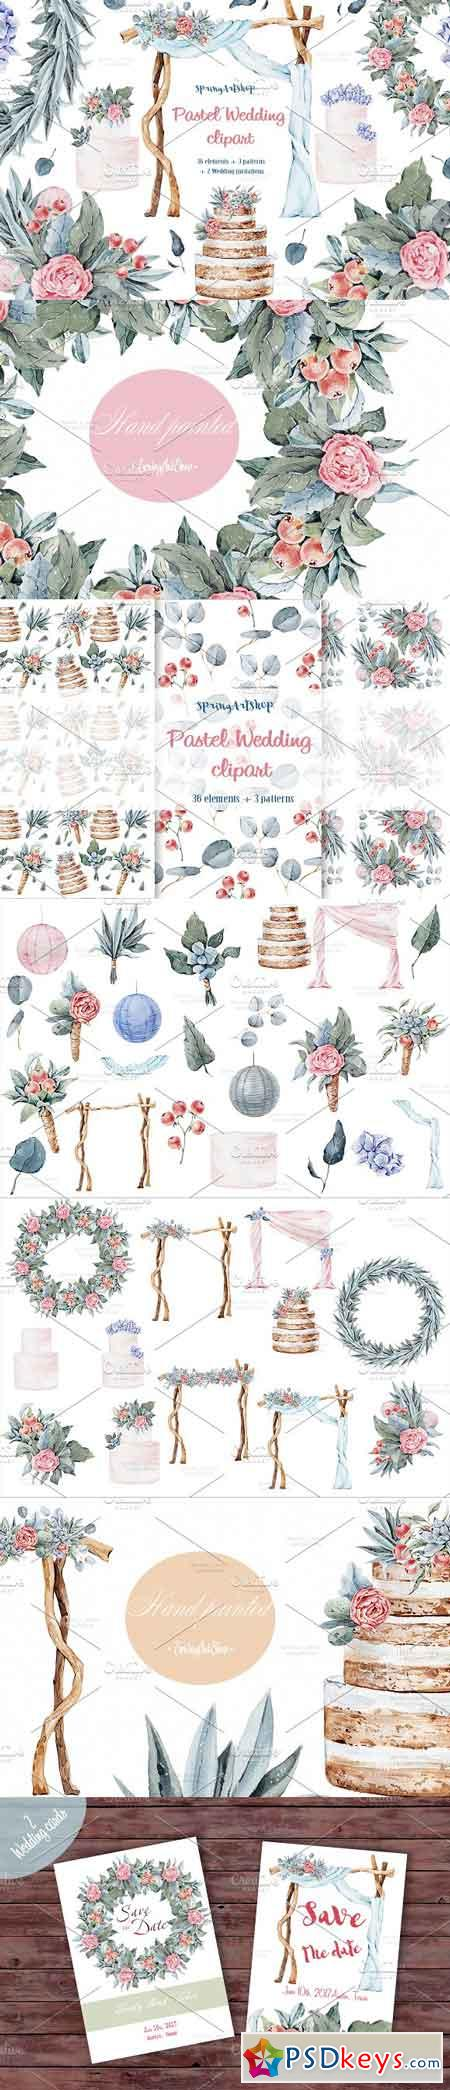 Pastel wedding watercolor clipart 1522384